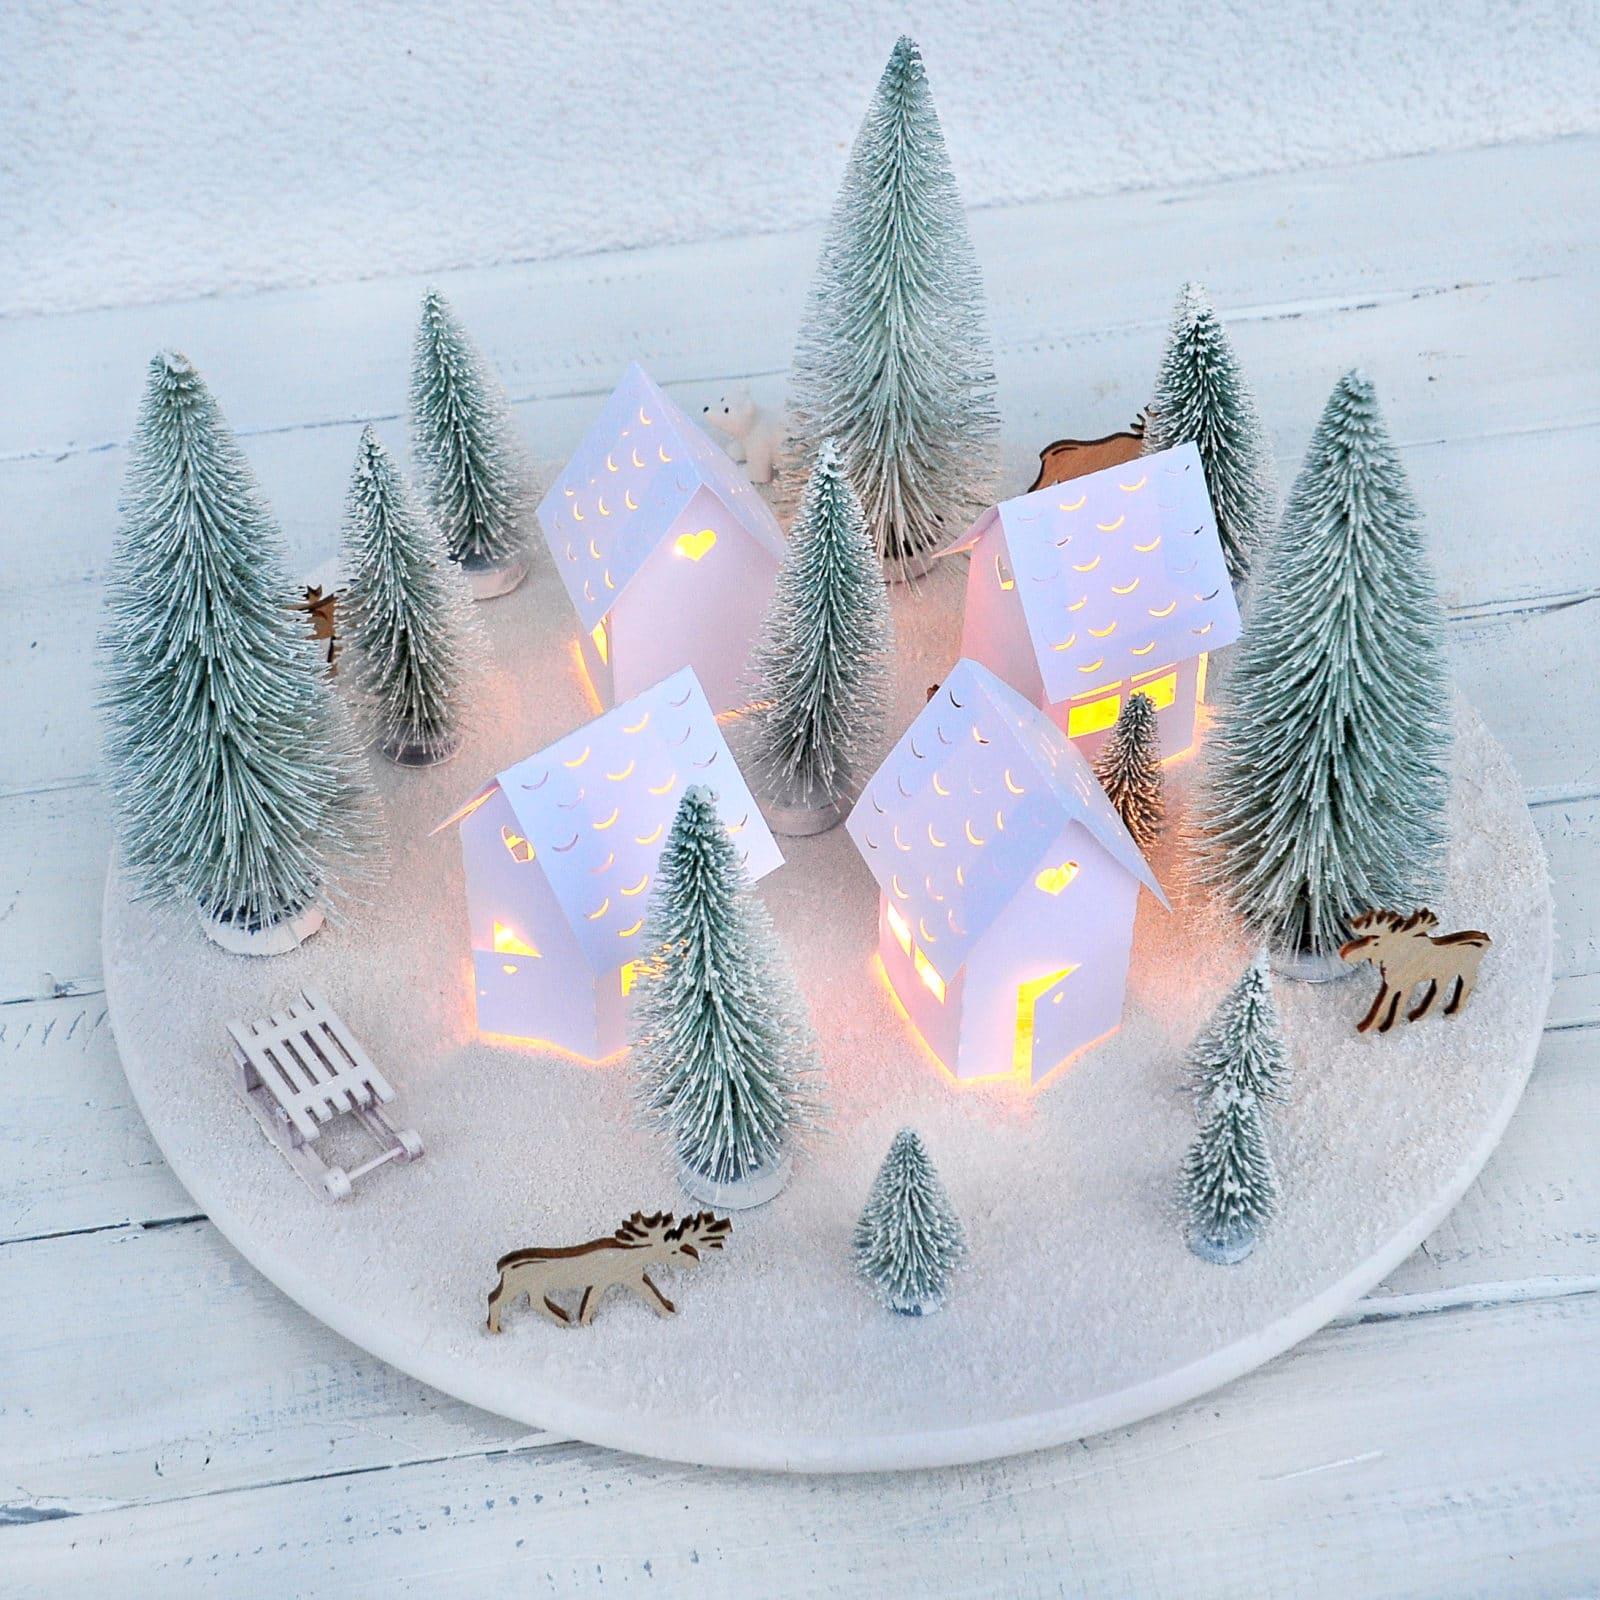 skandinavisches weihnachtsdorf adventskranz mal anders. Black Bedroom Furniture Sets. Home Design Ideas